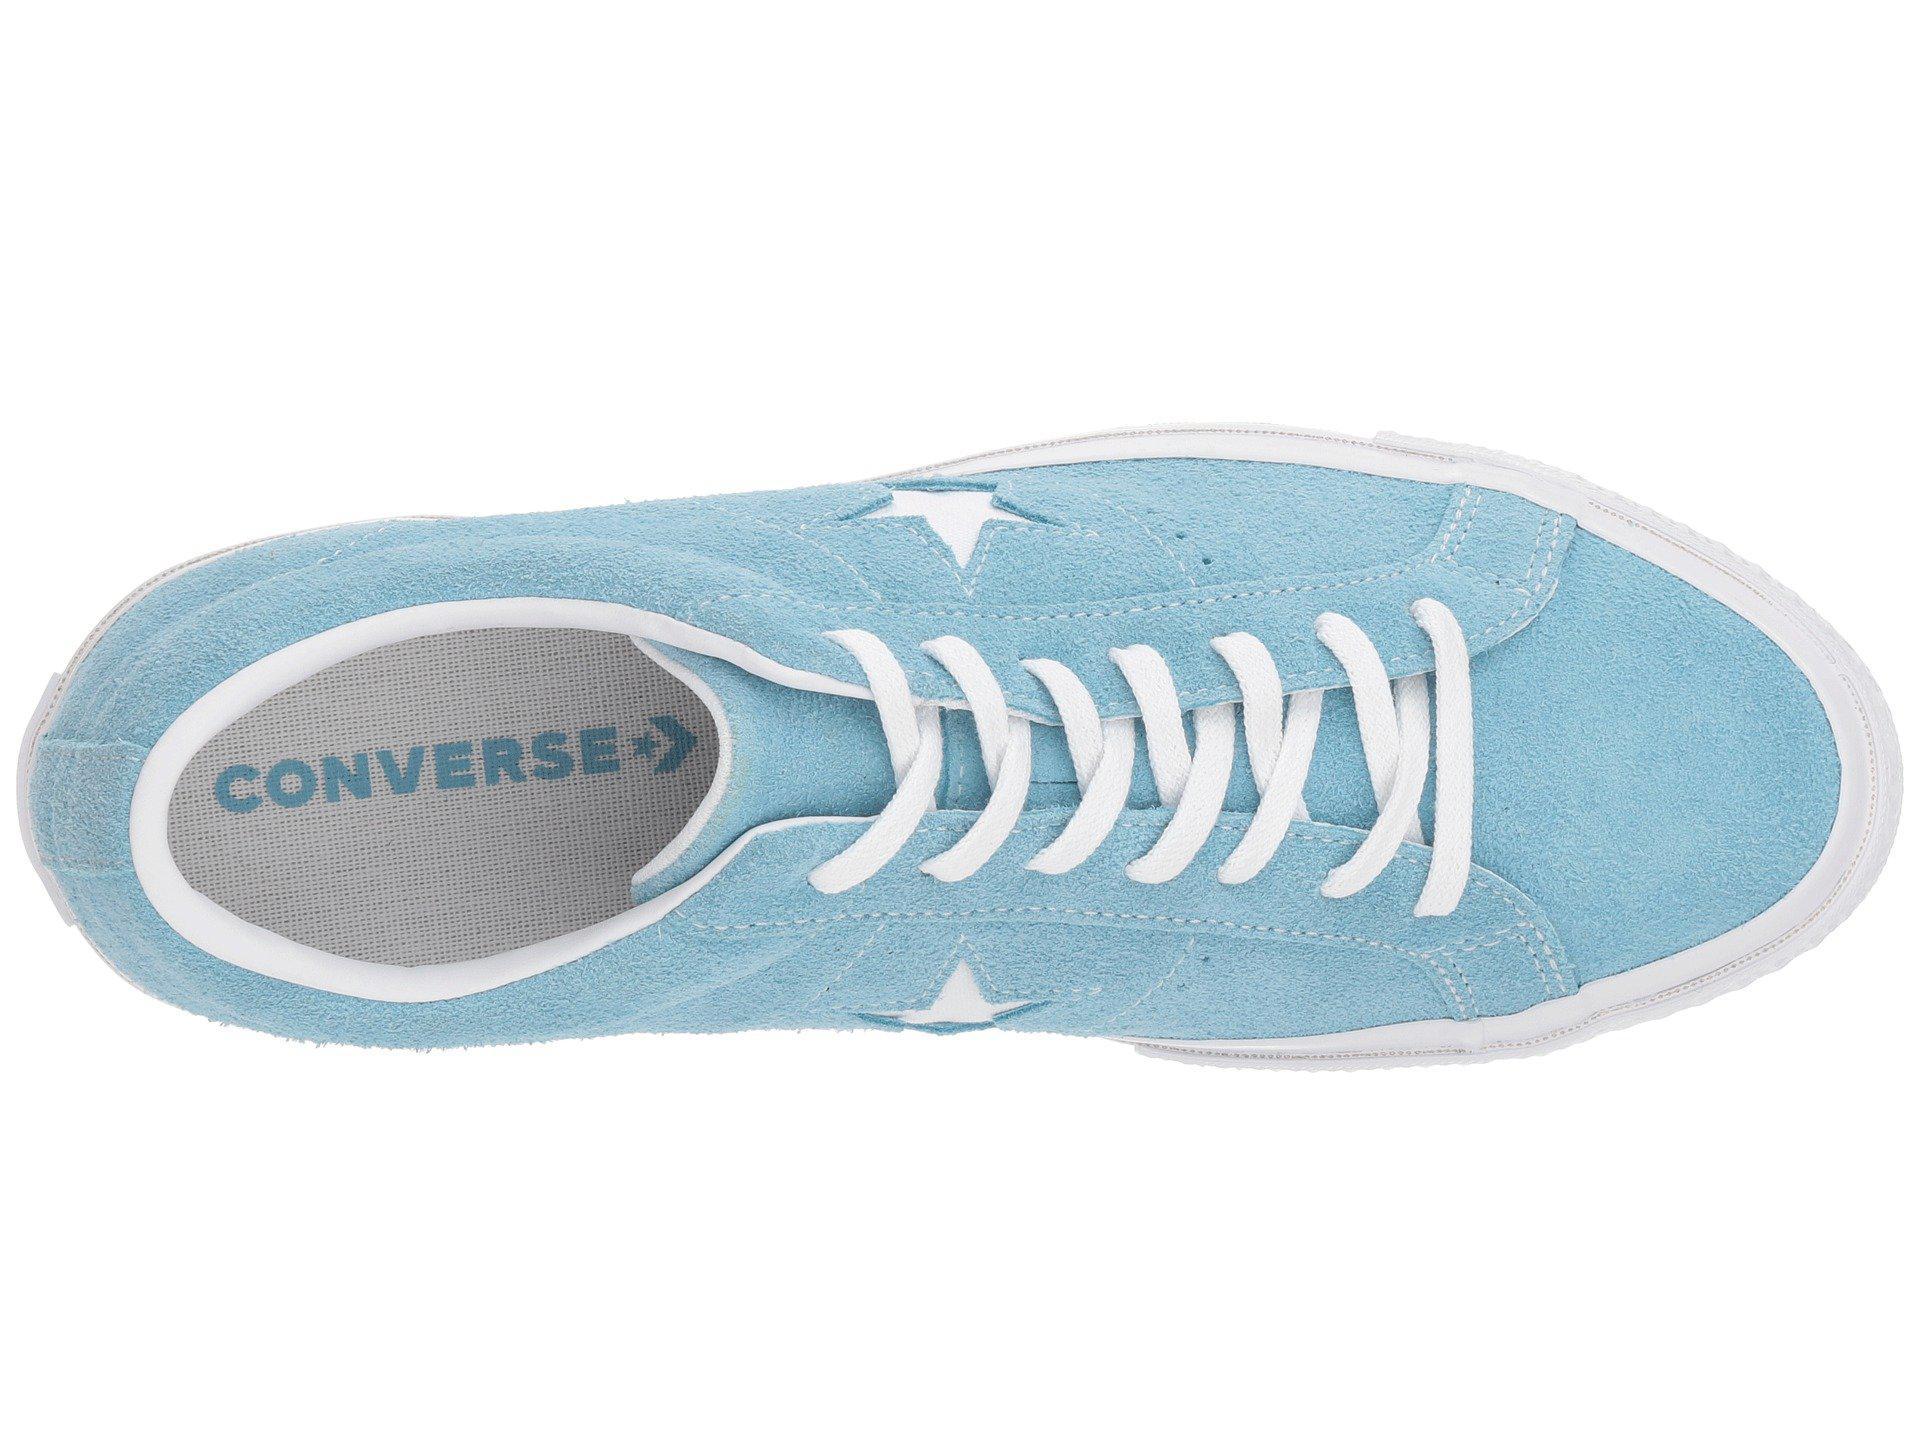 743bd19380c9 Converse - Blue One Star - Suede Ox - Lyst. View fullscreen